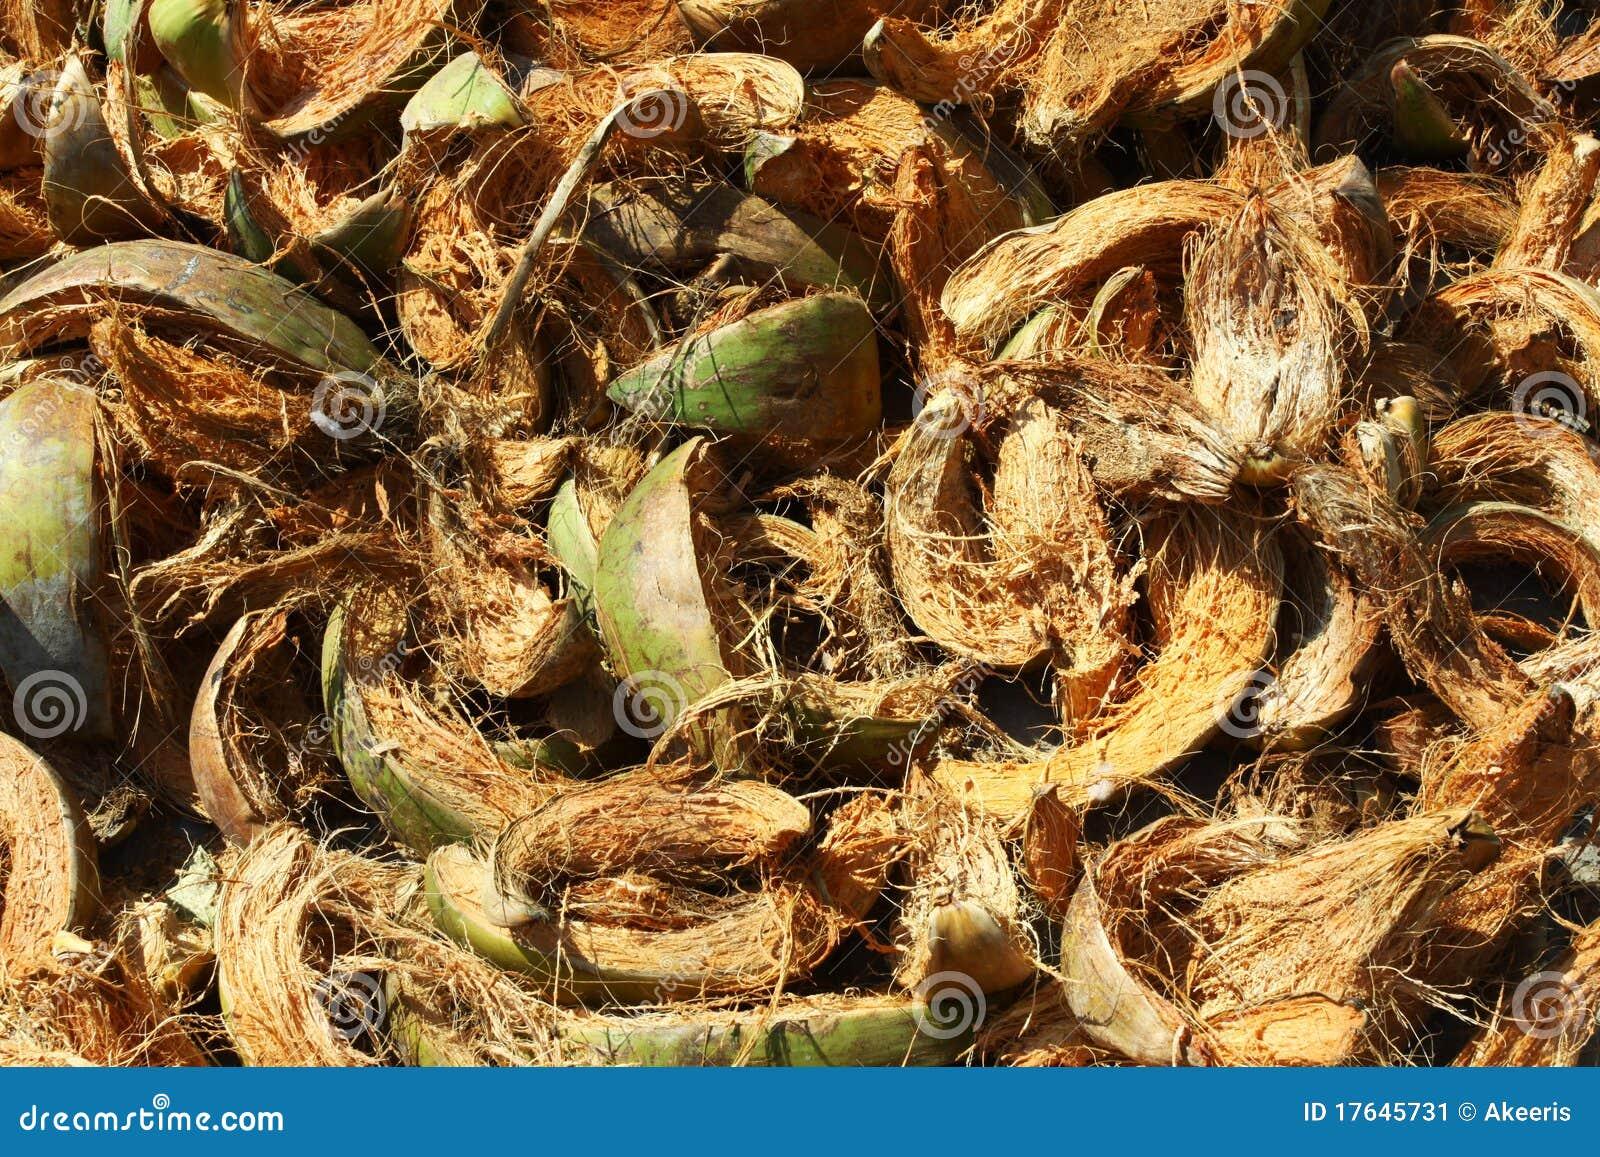 coconut coir fibre stock image image 17645731. Black Bedroom Furniture Sets. Home Design Ideas